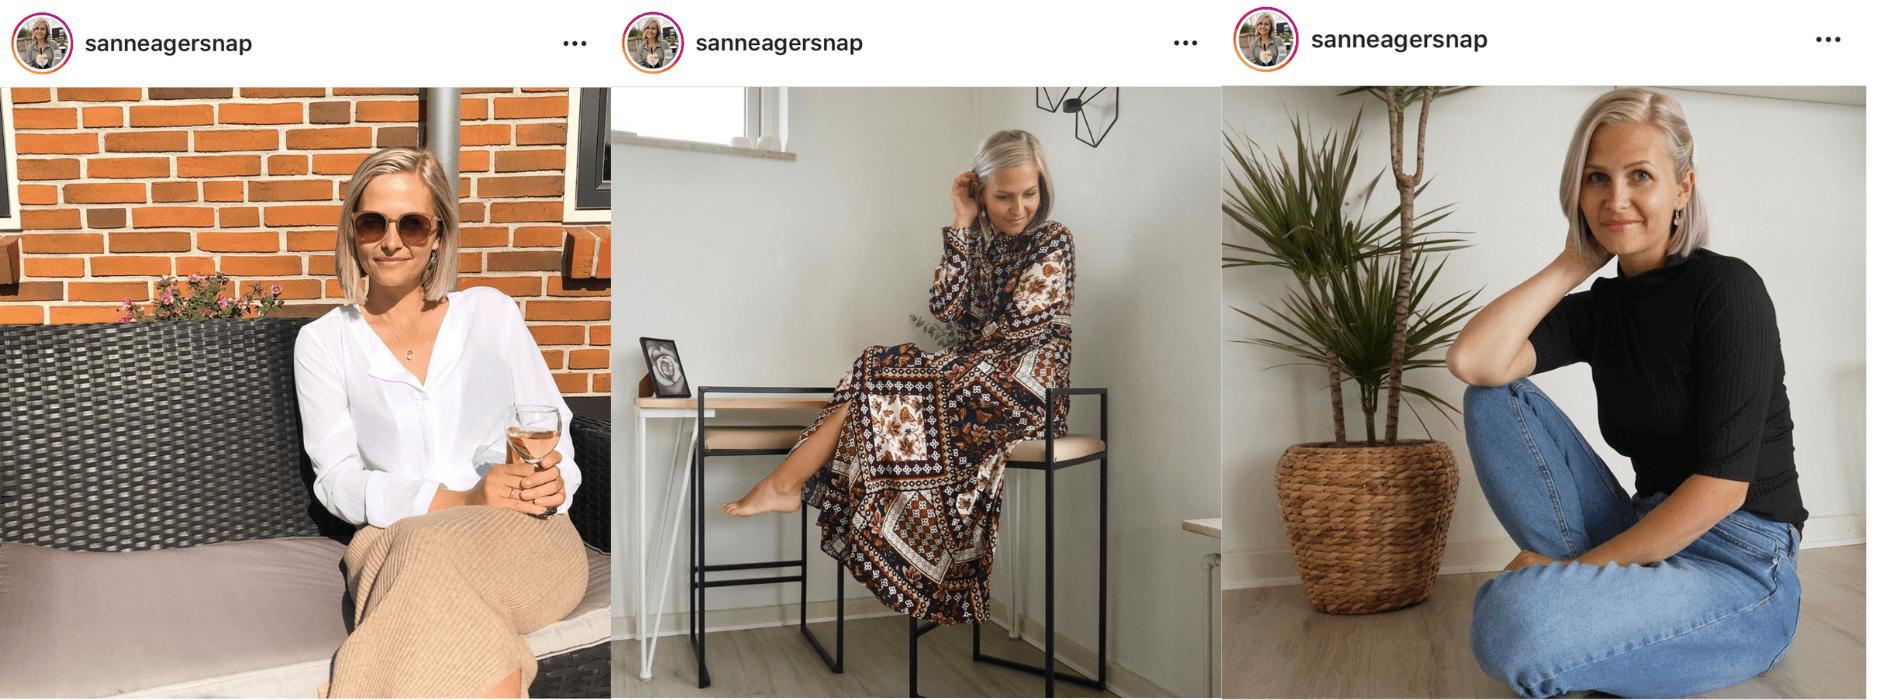 Sanne Agersnap influencer